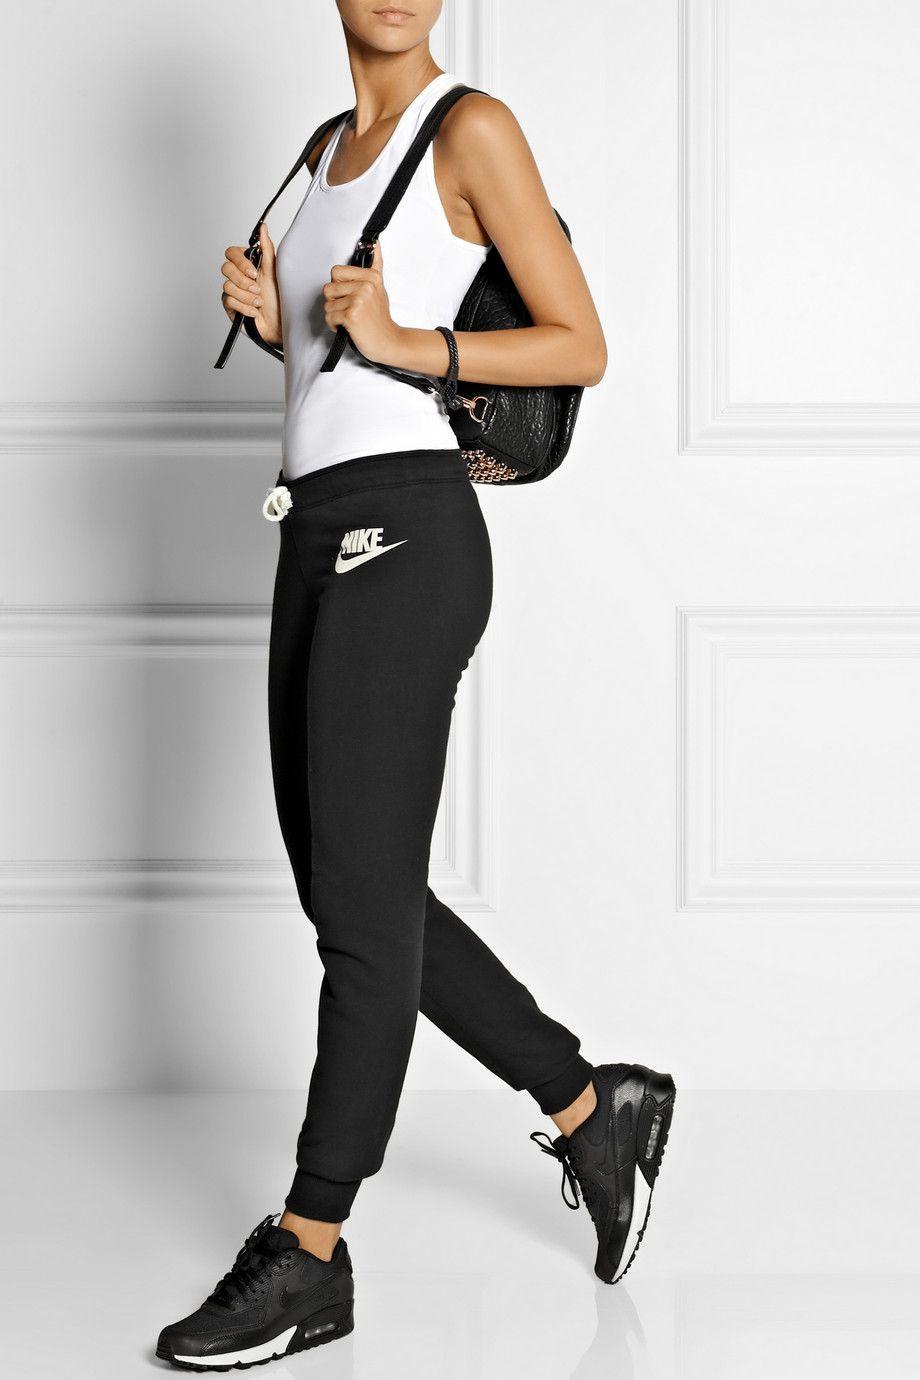 nike women clothing 2014 wwwpixsharkcom images